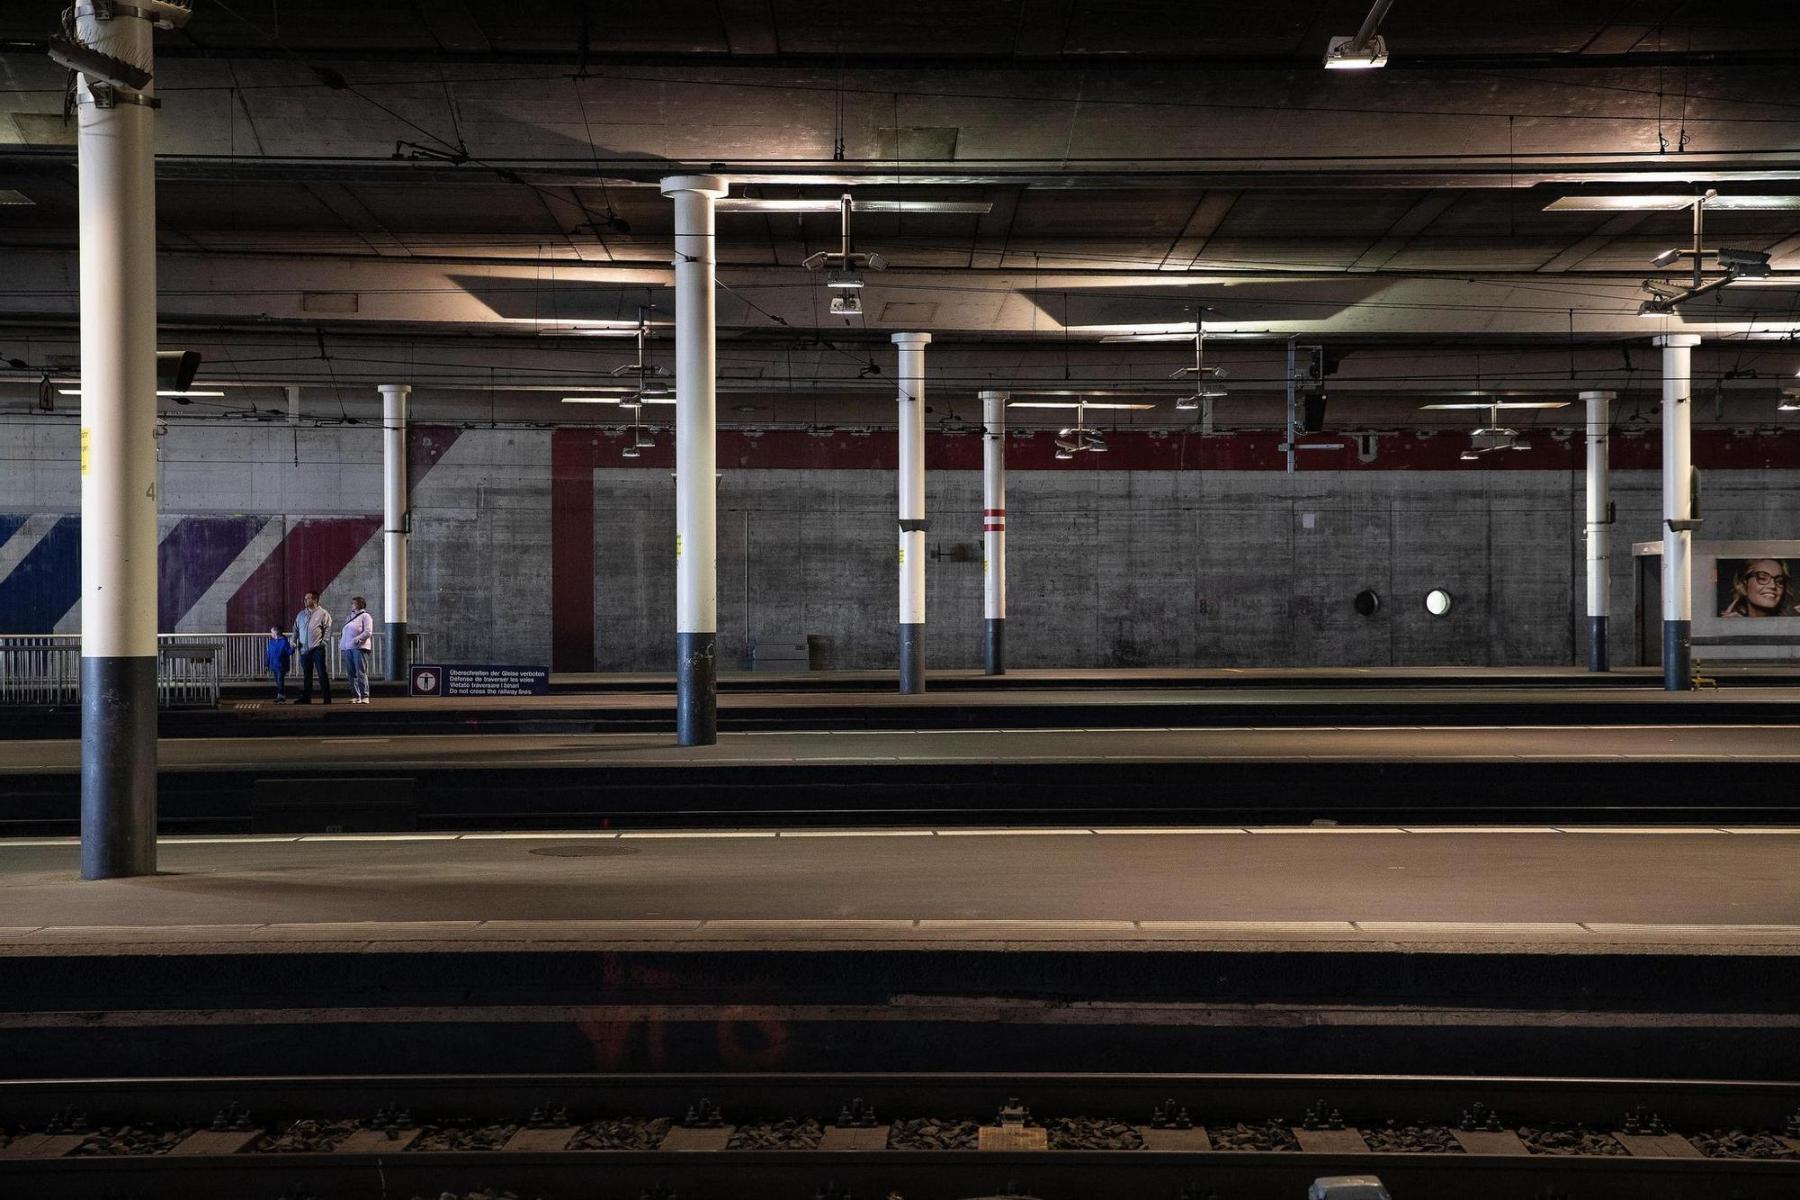 Impression aus dem Bahnhof Bern am 17. März 2020. Foto: Christian Pfander